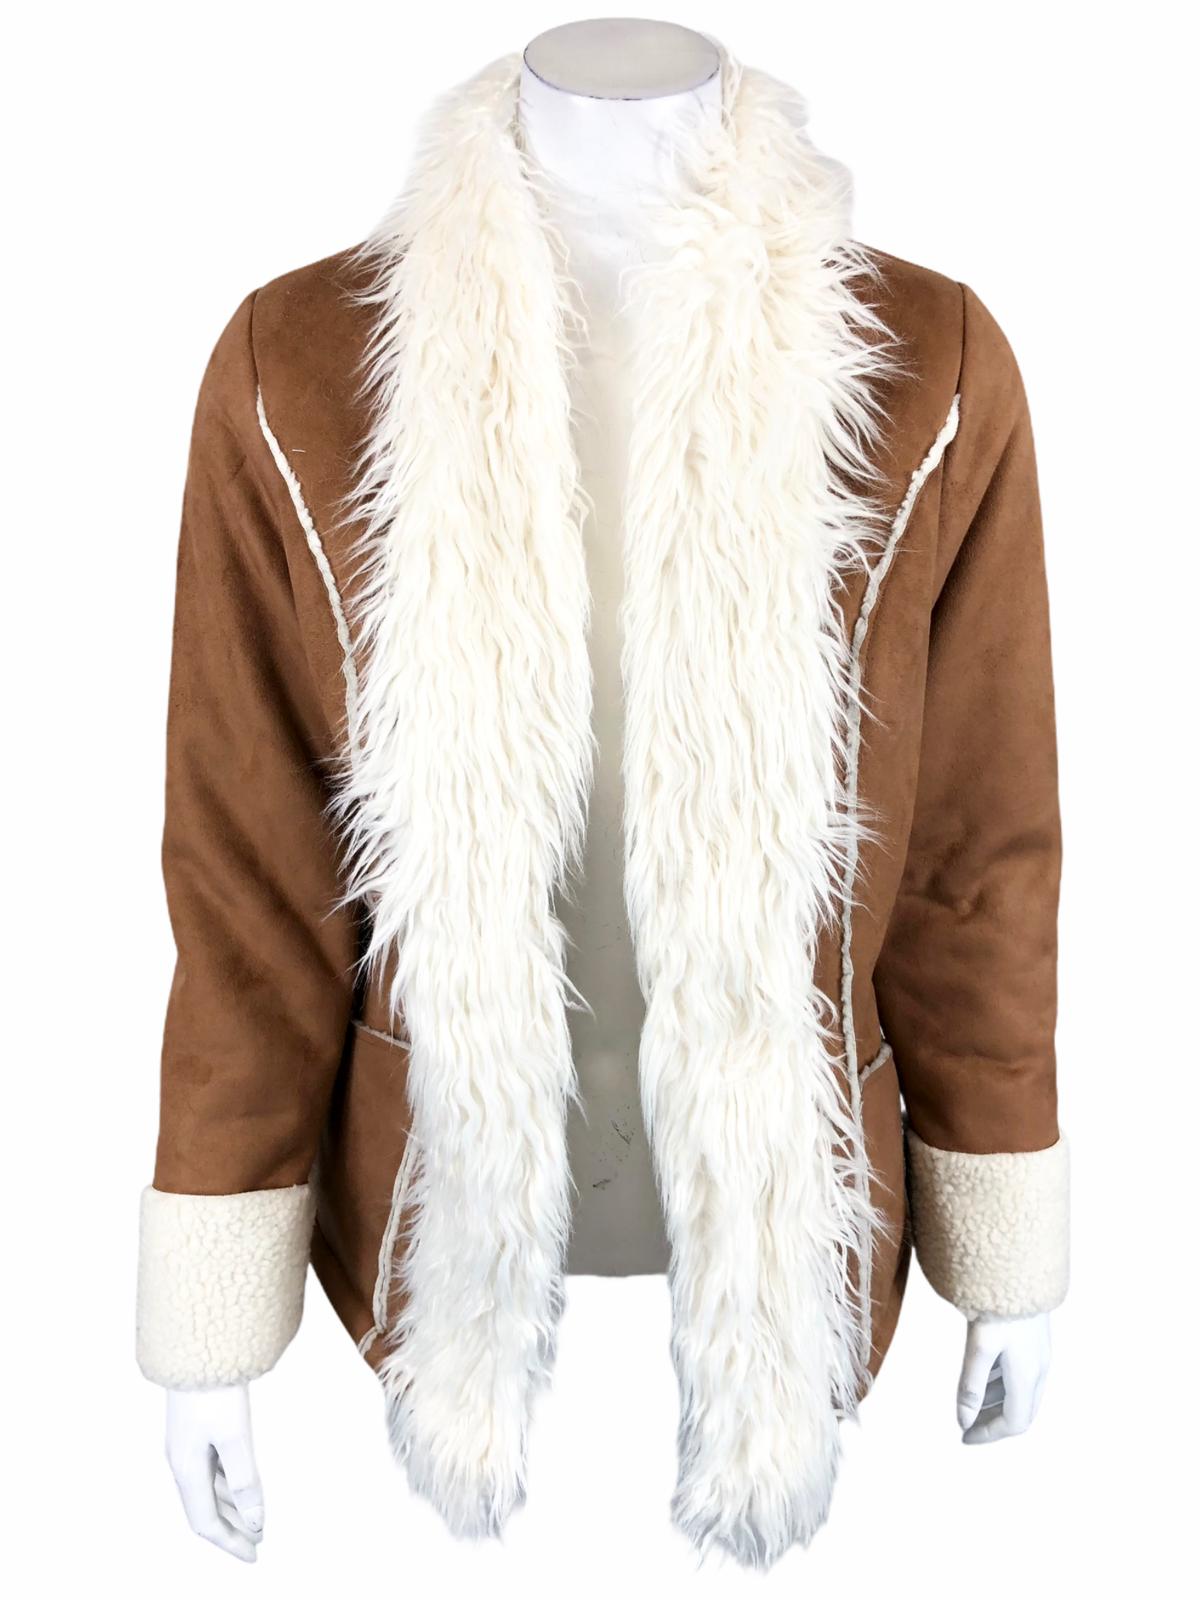 Rachel Hollis Ltd. Faux Suede Jacket with Shearling Trim Camel XXX-Small Size